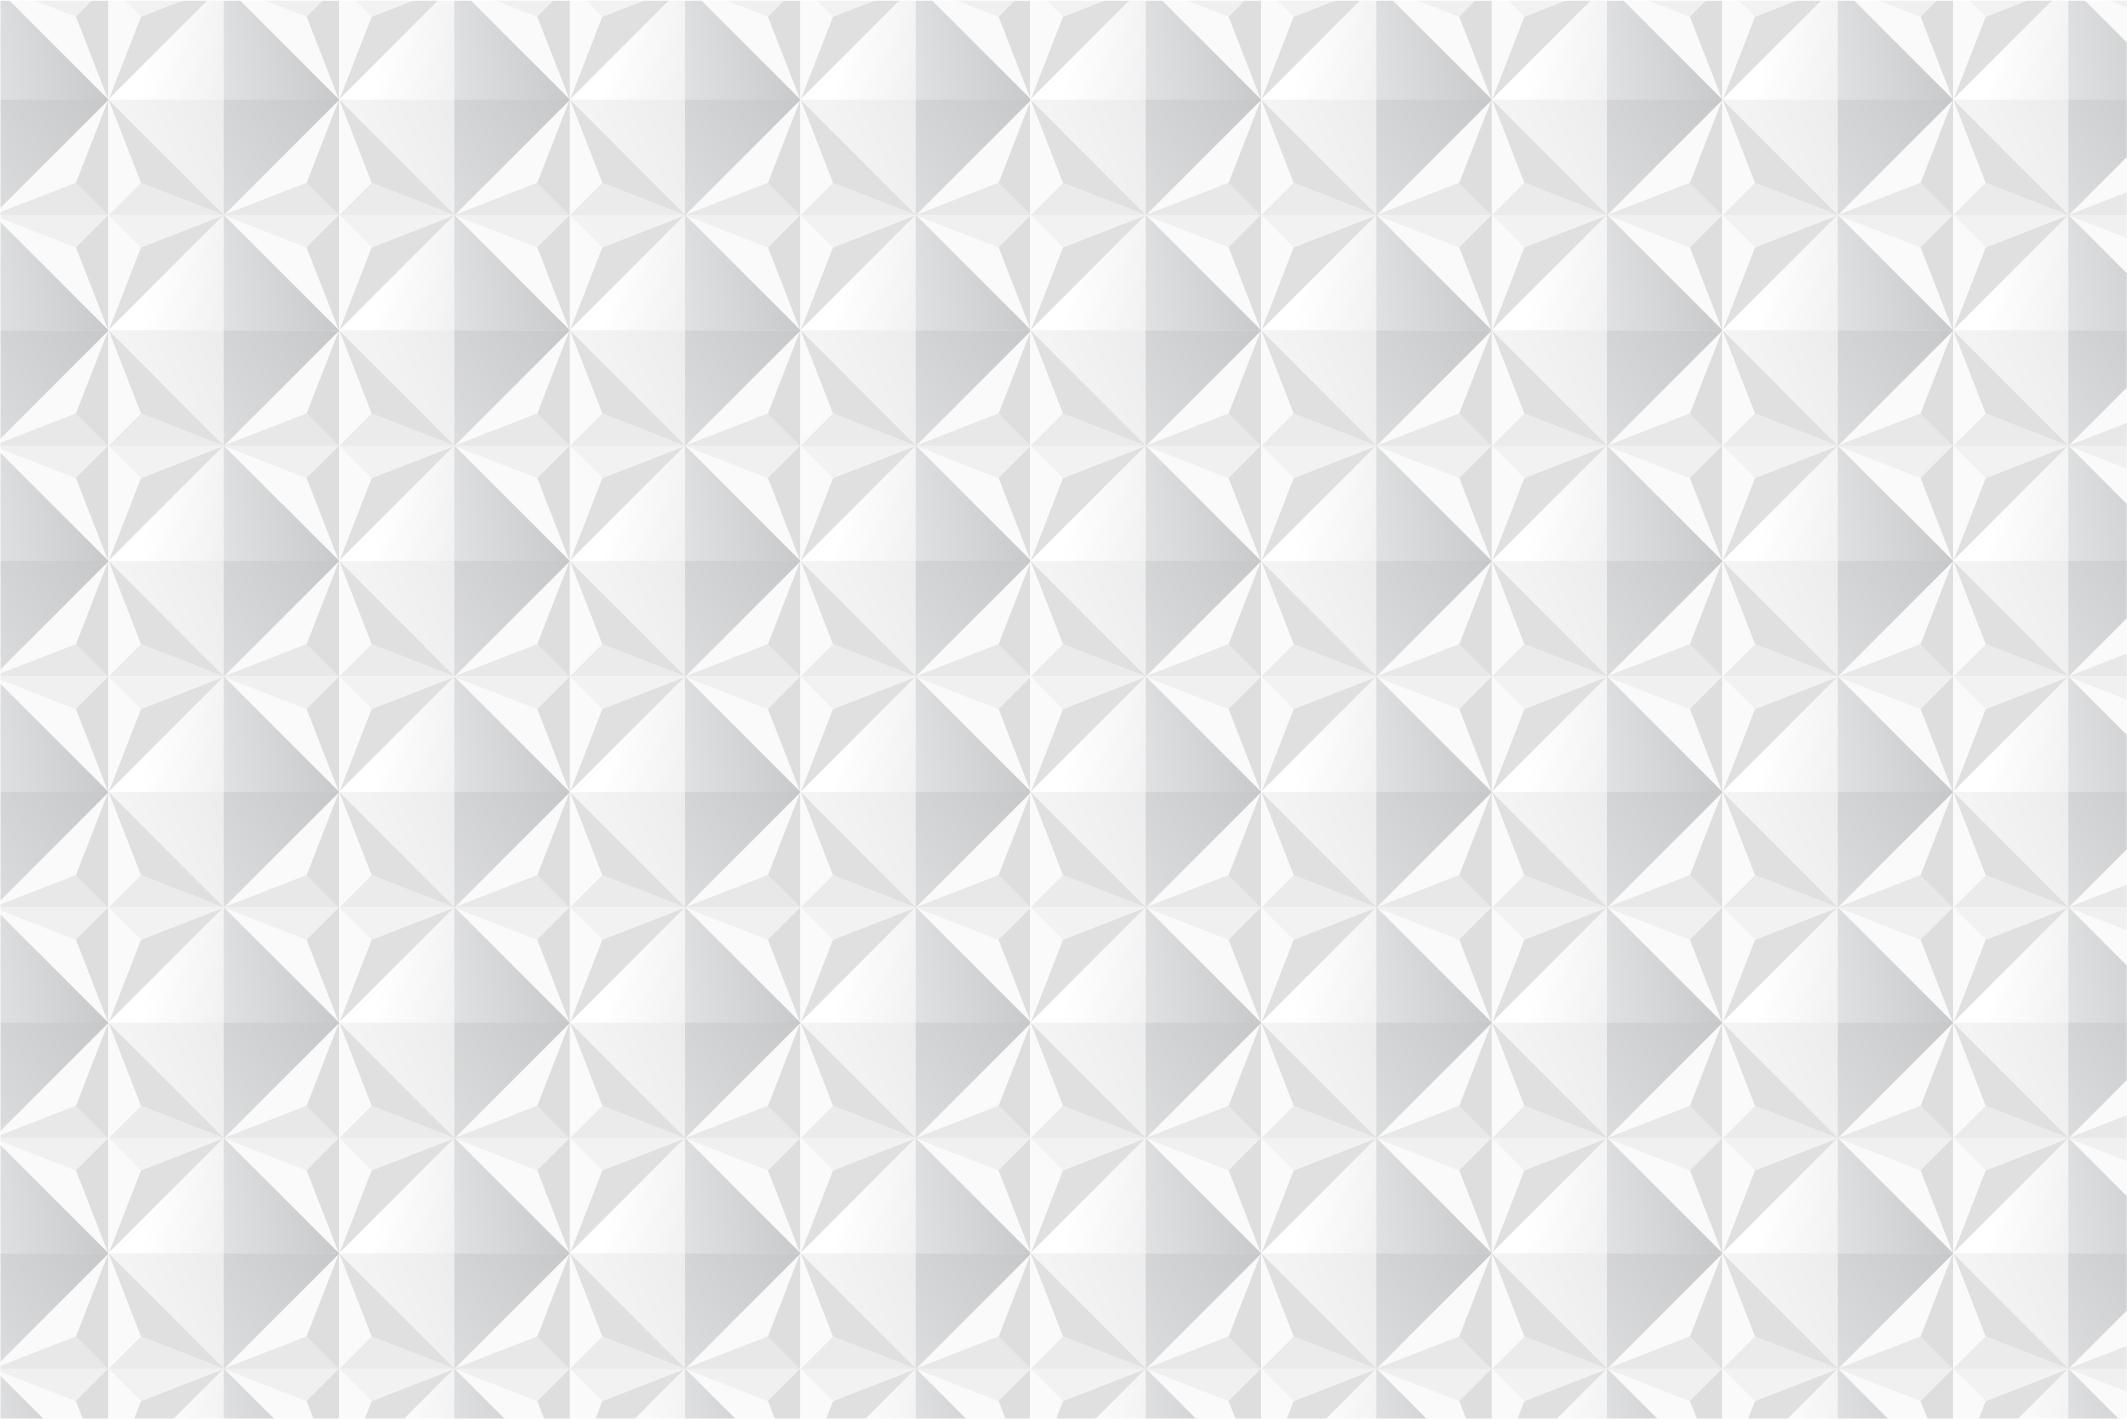 White geometric 3d seamless textures example image 10